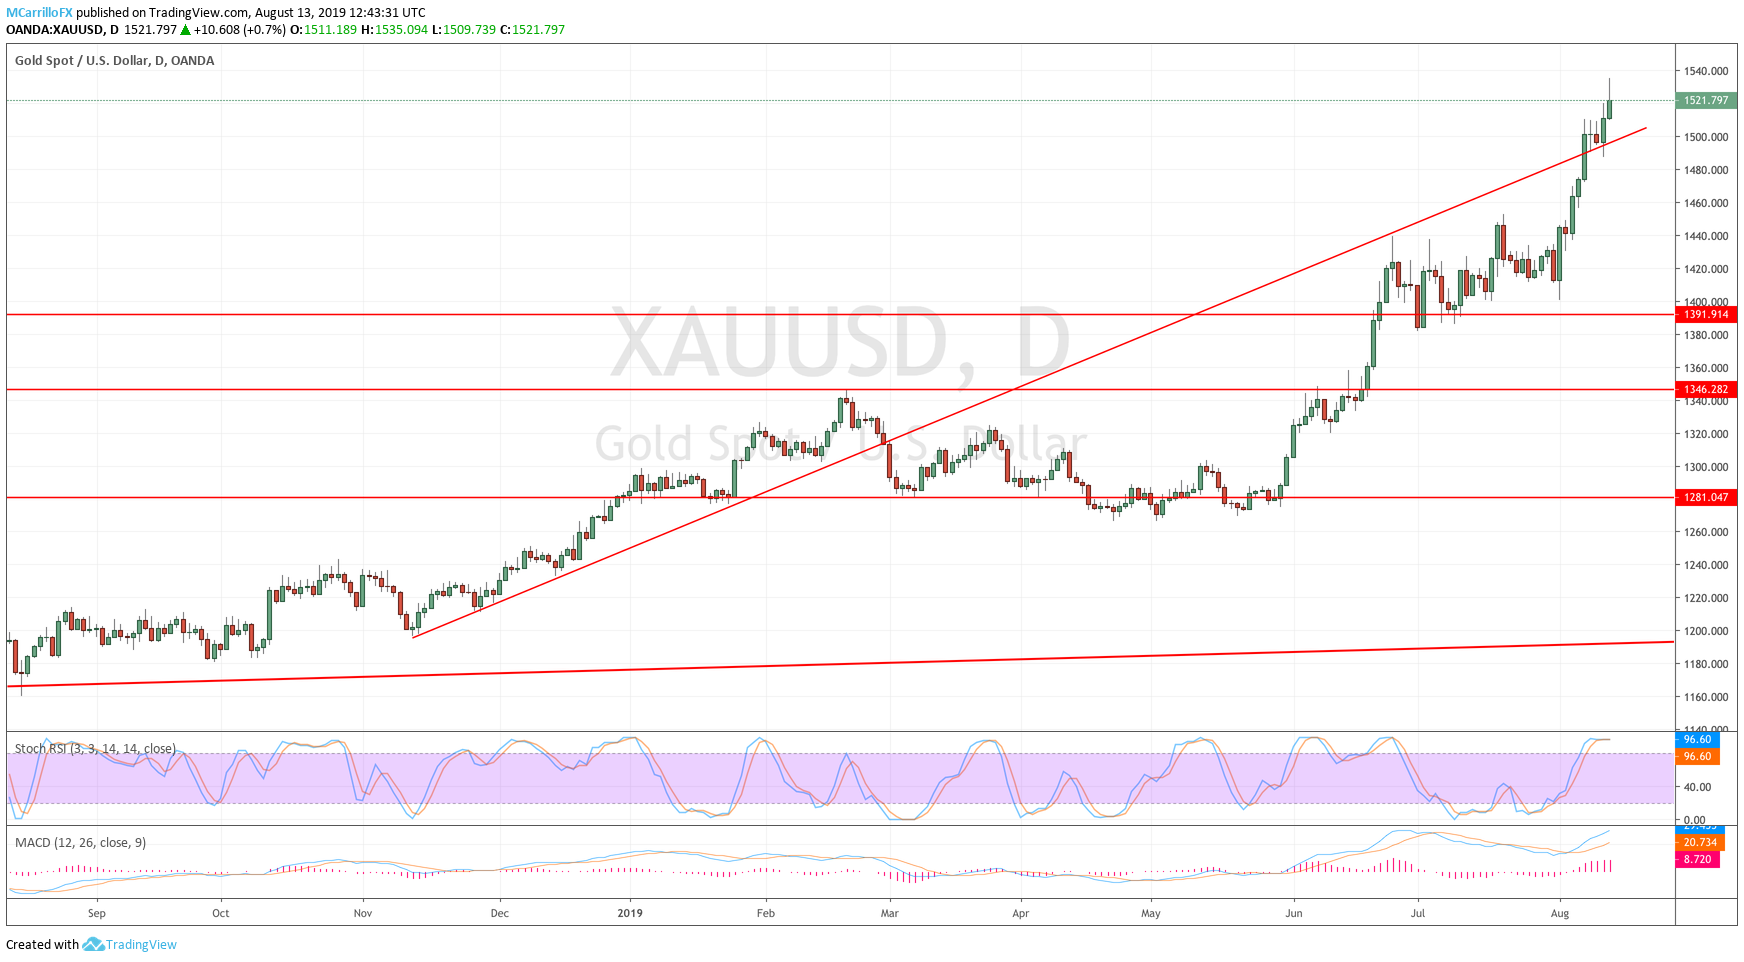 XAUUSD daily chart August 13